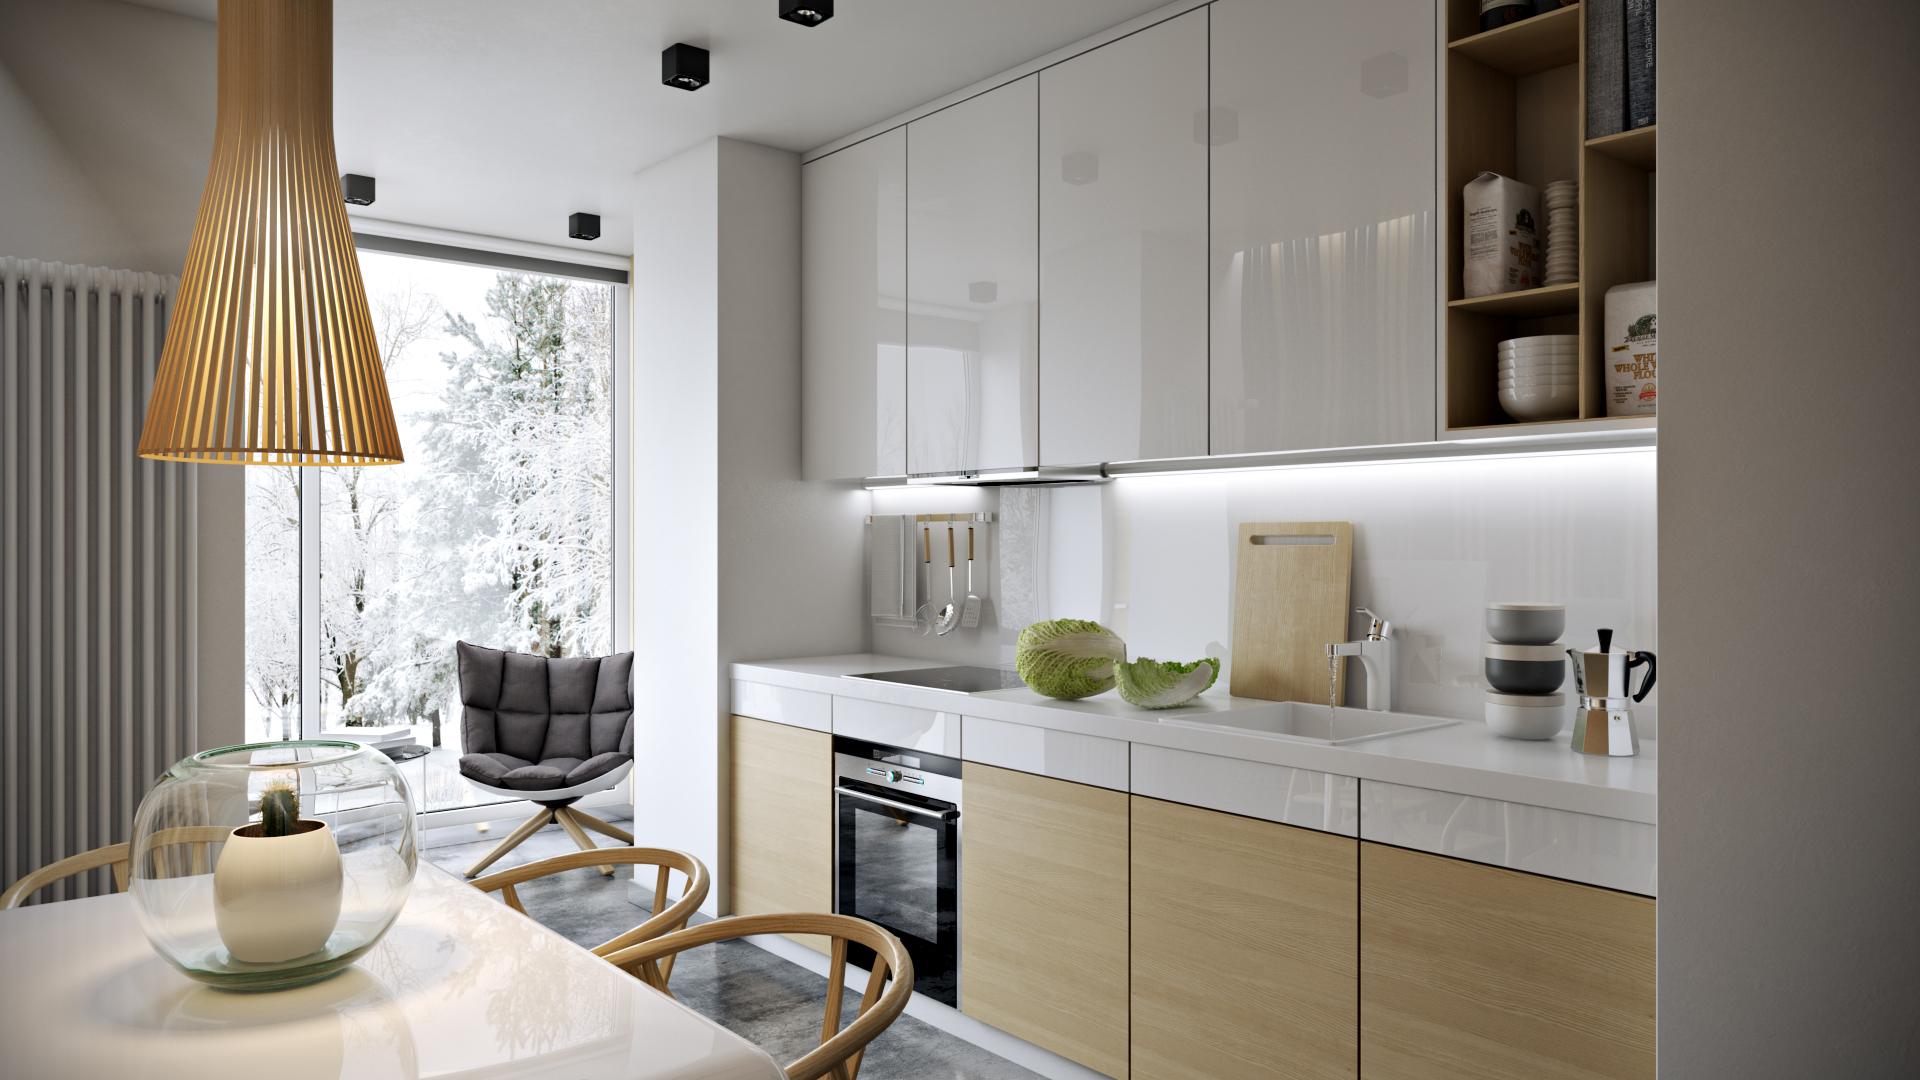 Дизайн бежево-белой кухни 11 кв м